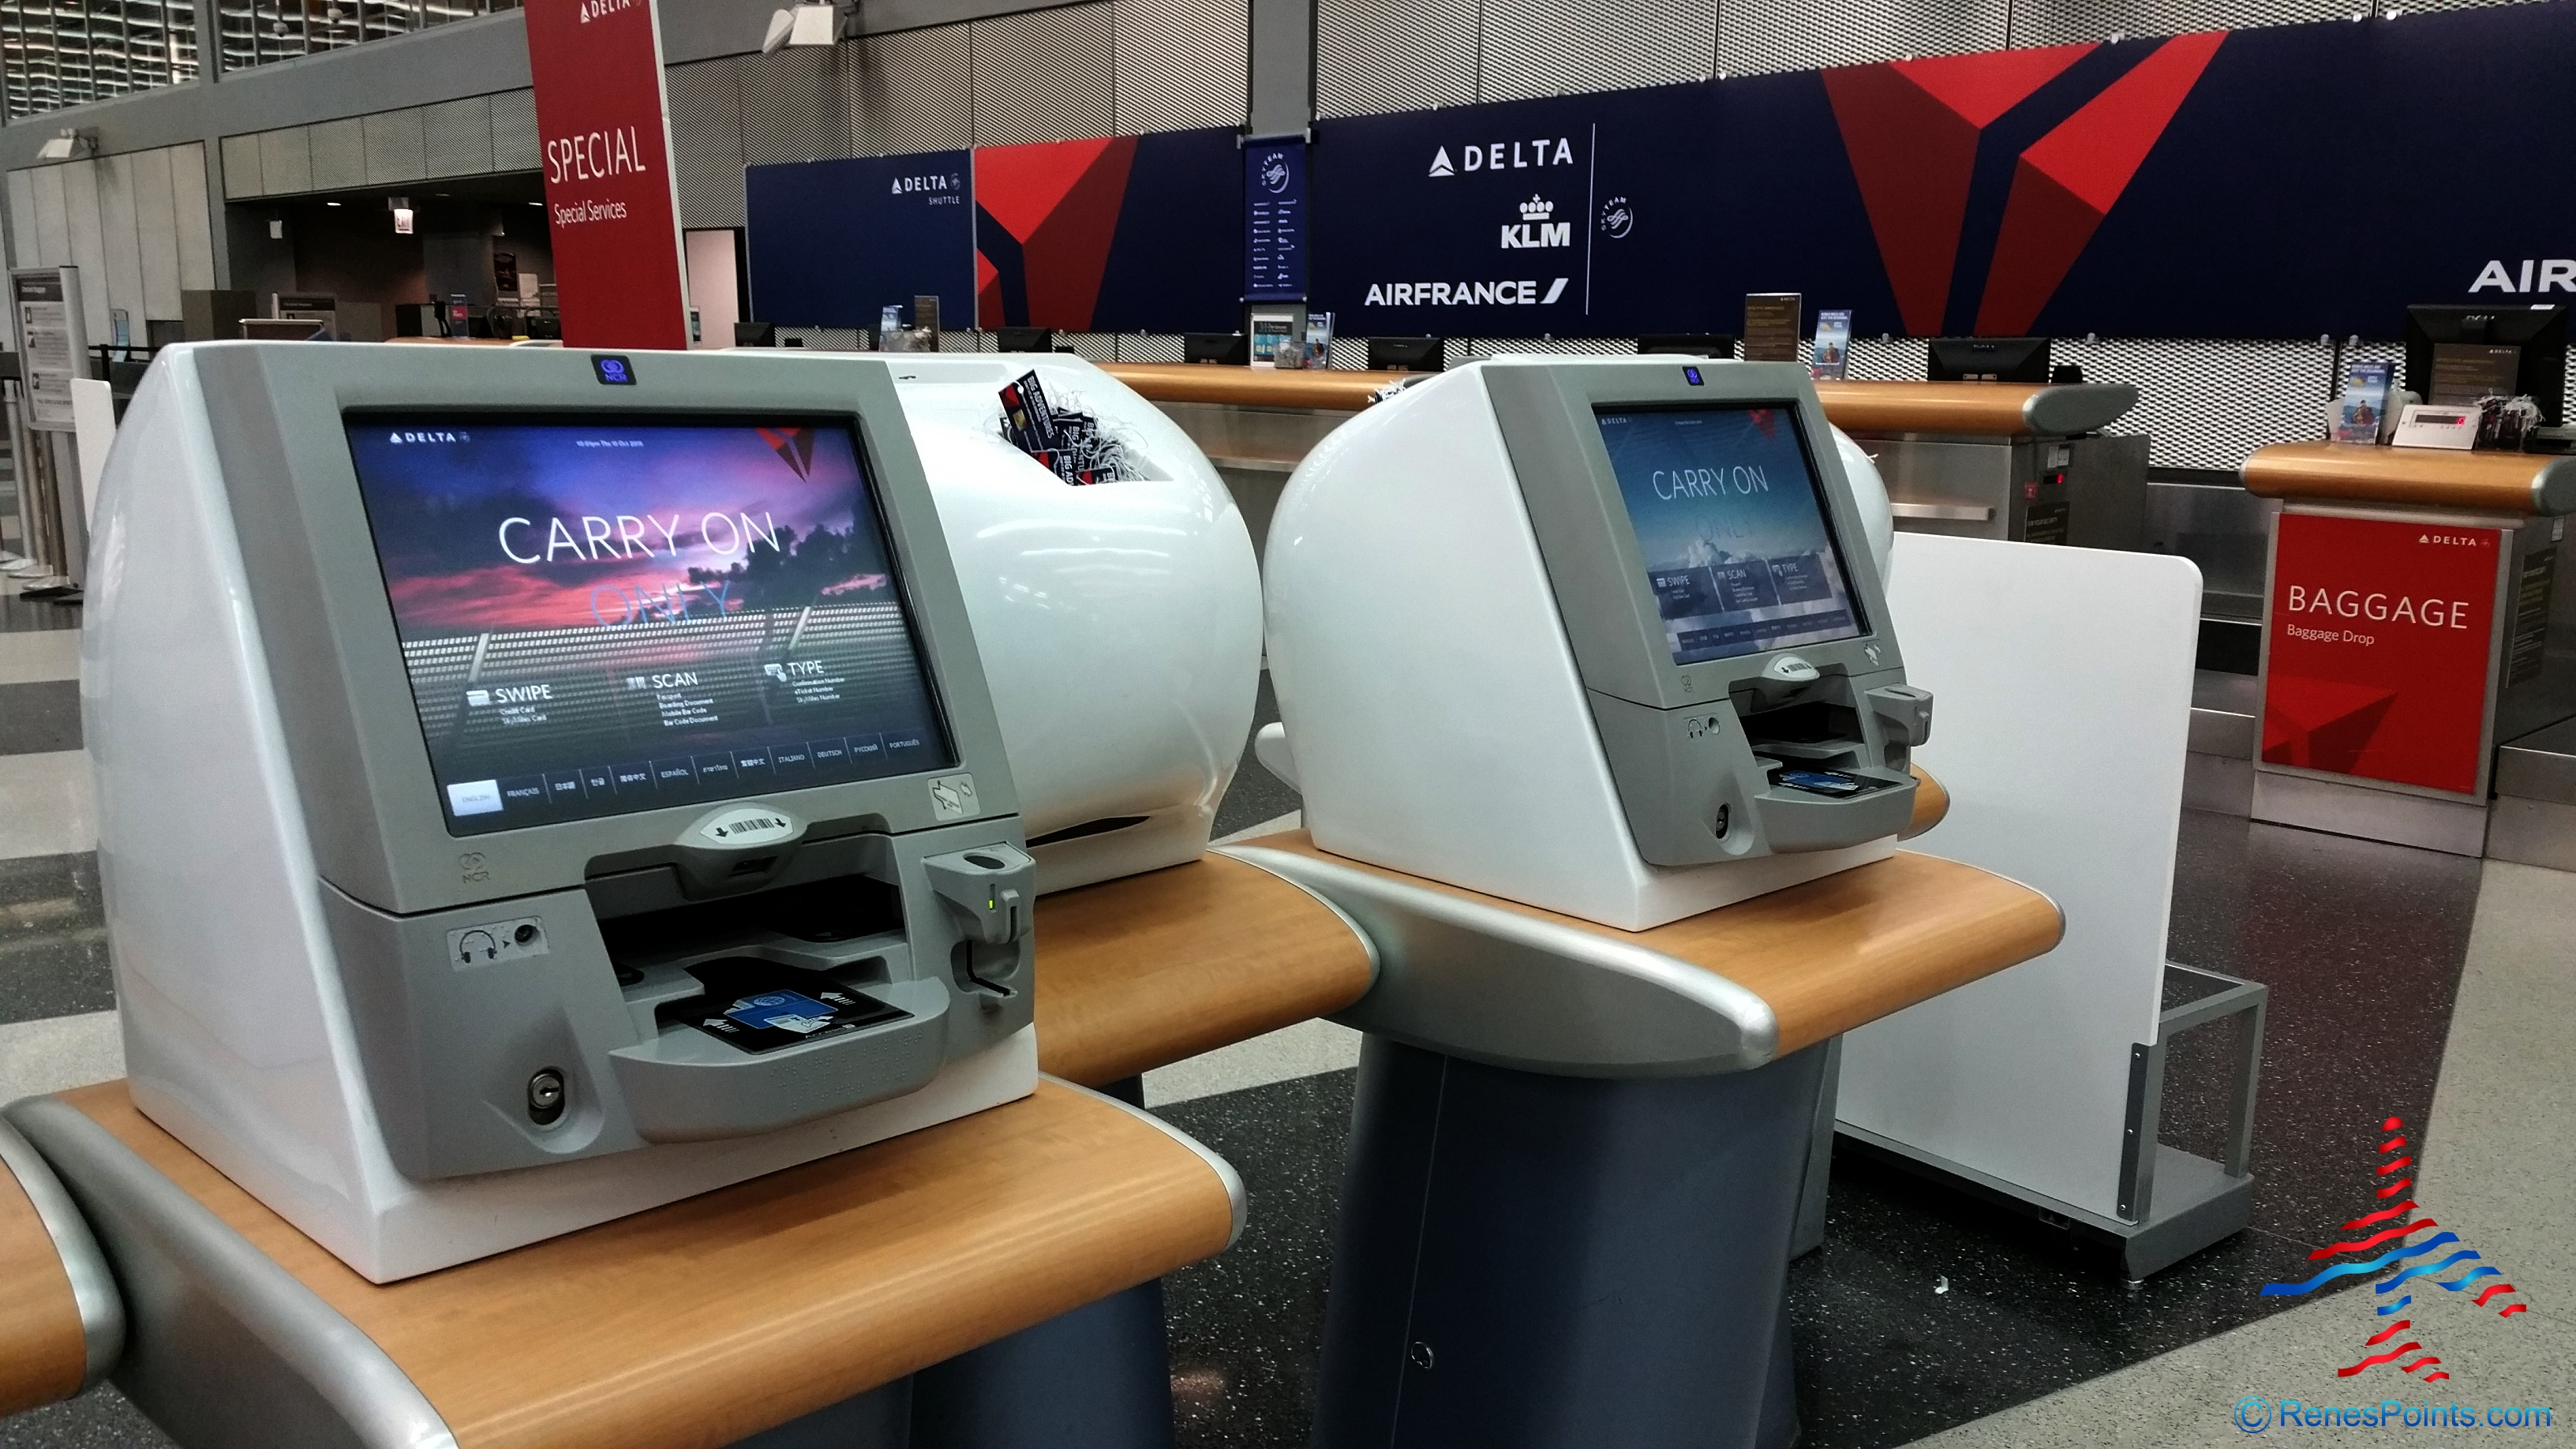 delta air lines self check in kiosk stock photo